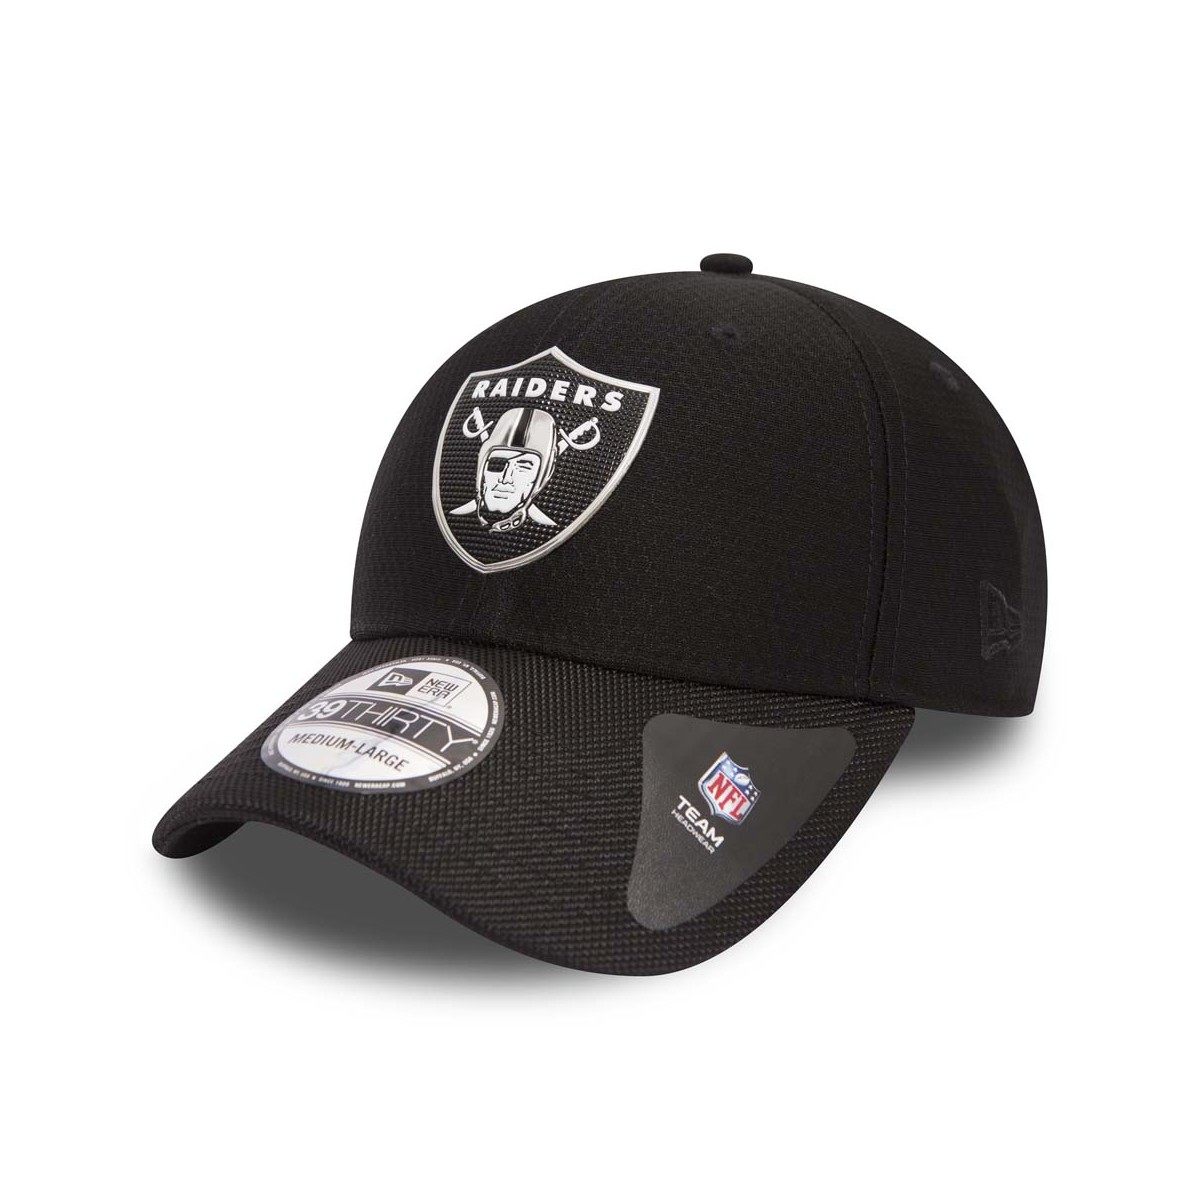 CAPPELLO NEW ERA 39THIRTY NFL BLACK COLL OAKLAND RAIDERS 39THIRTY ... 99e06d65b5fe